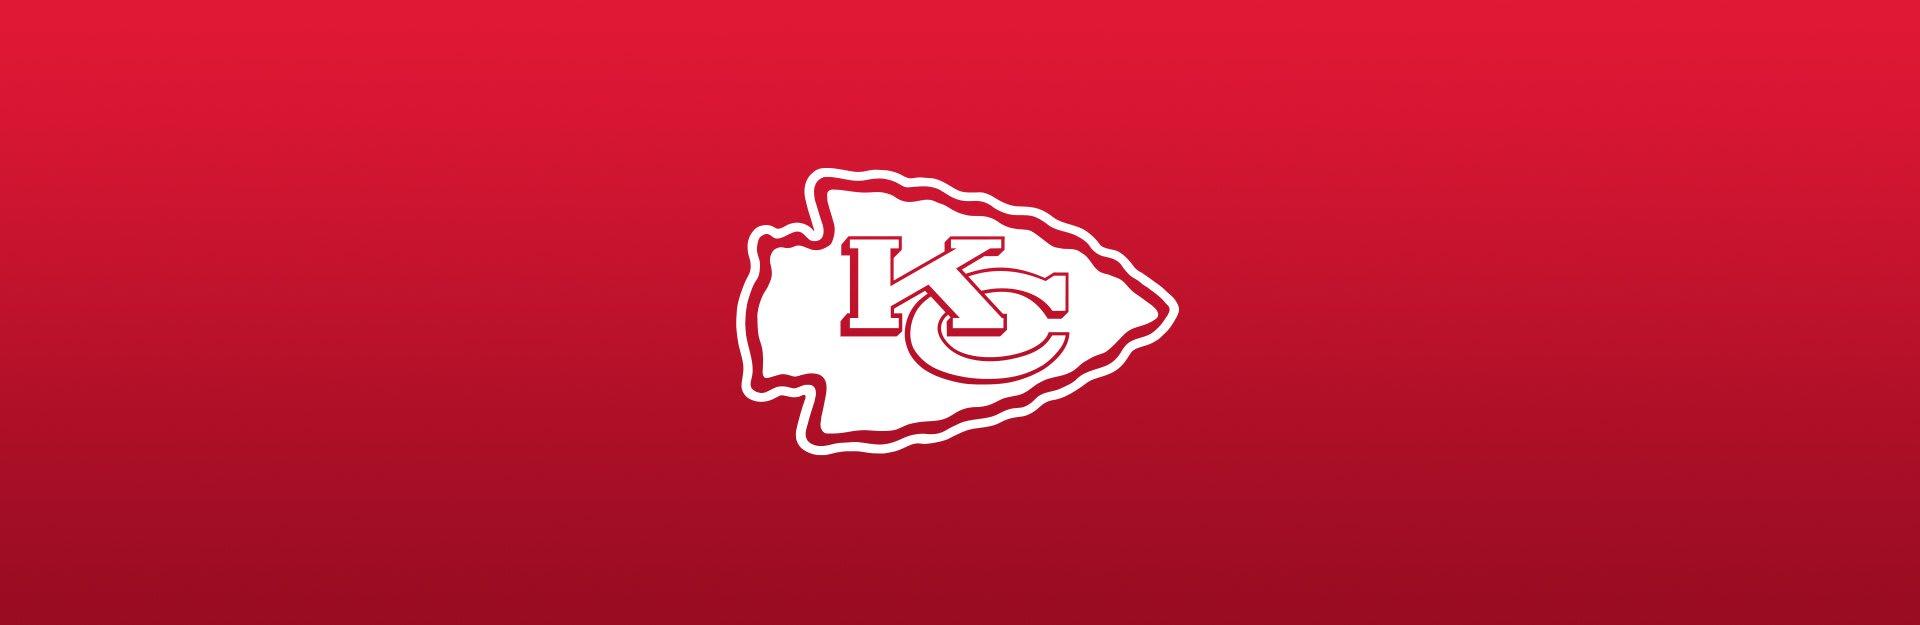 Kansas City Chiefs logo on red background